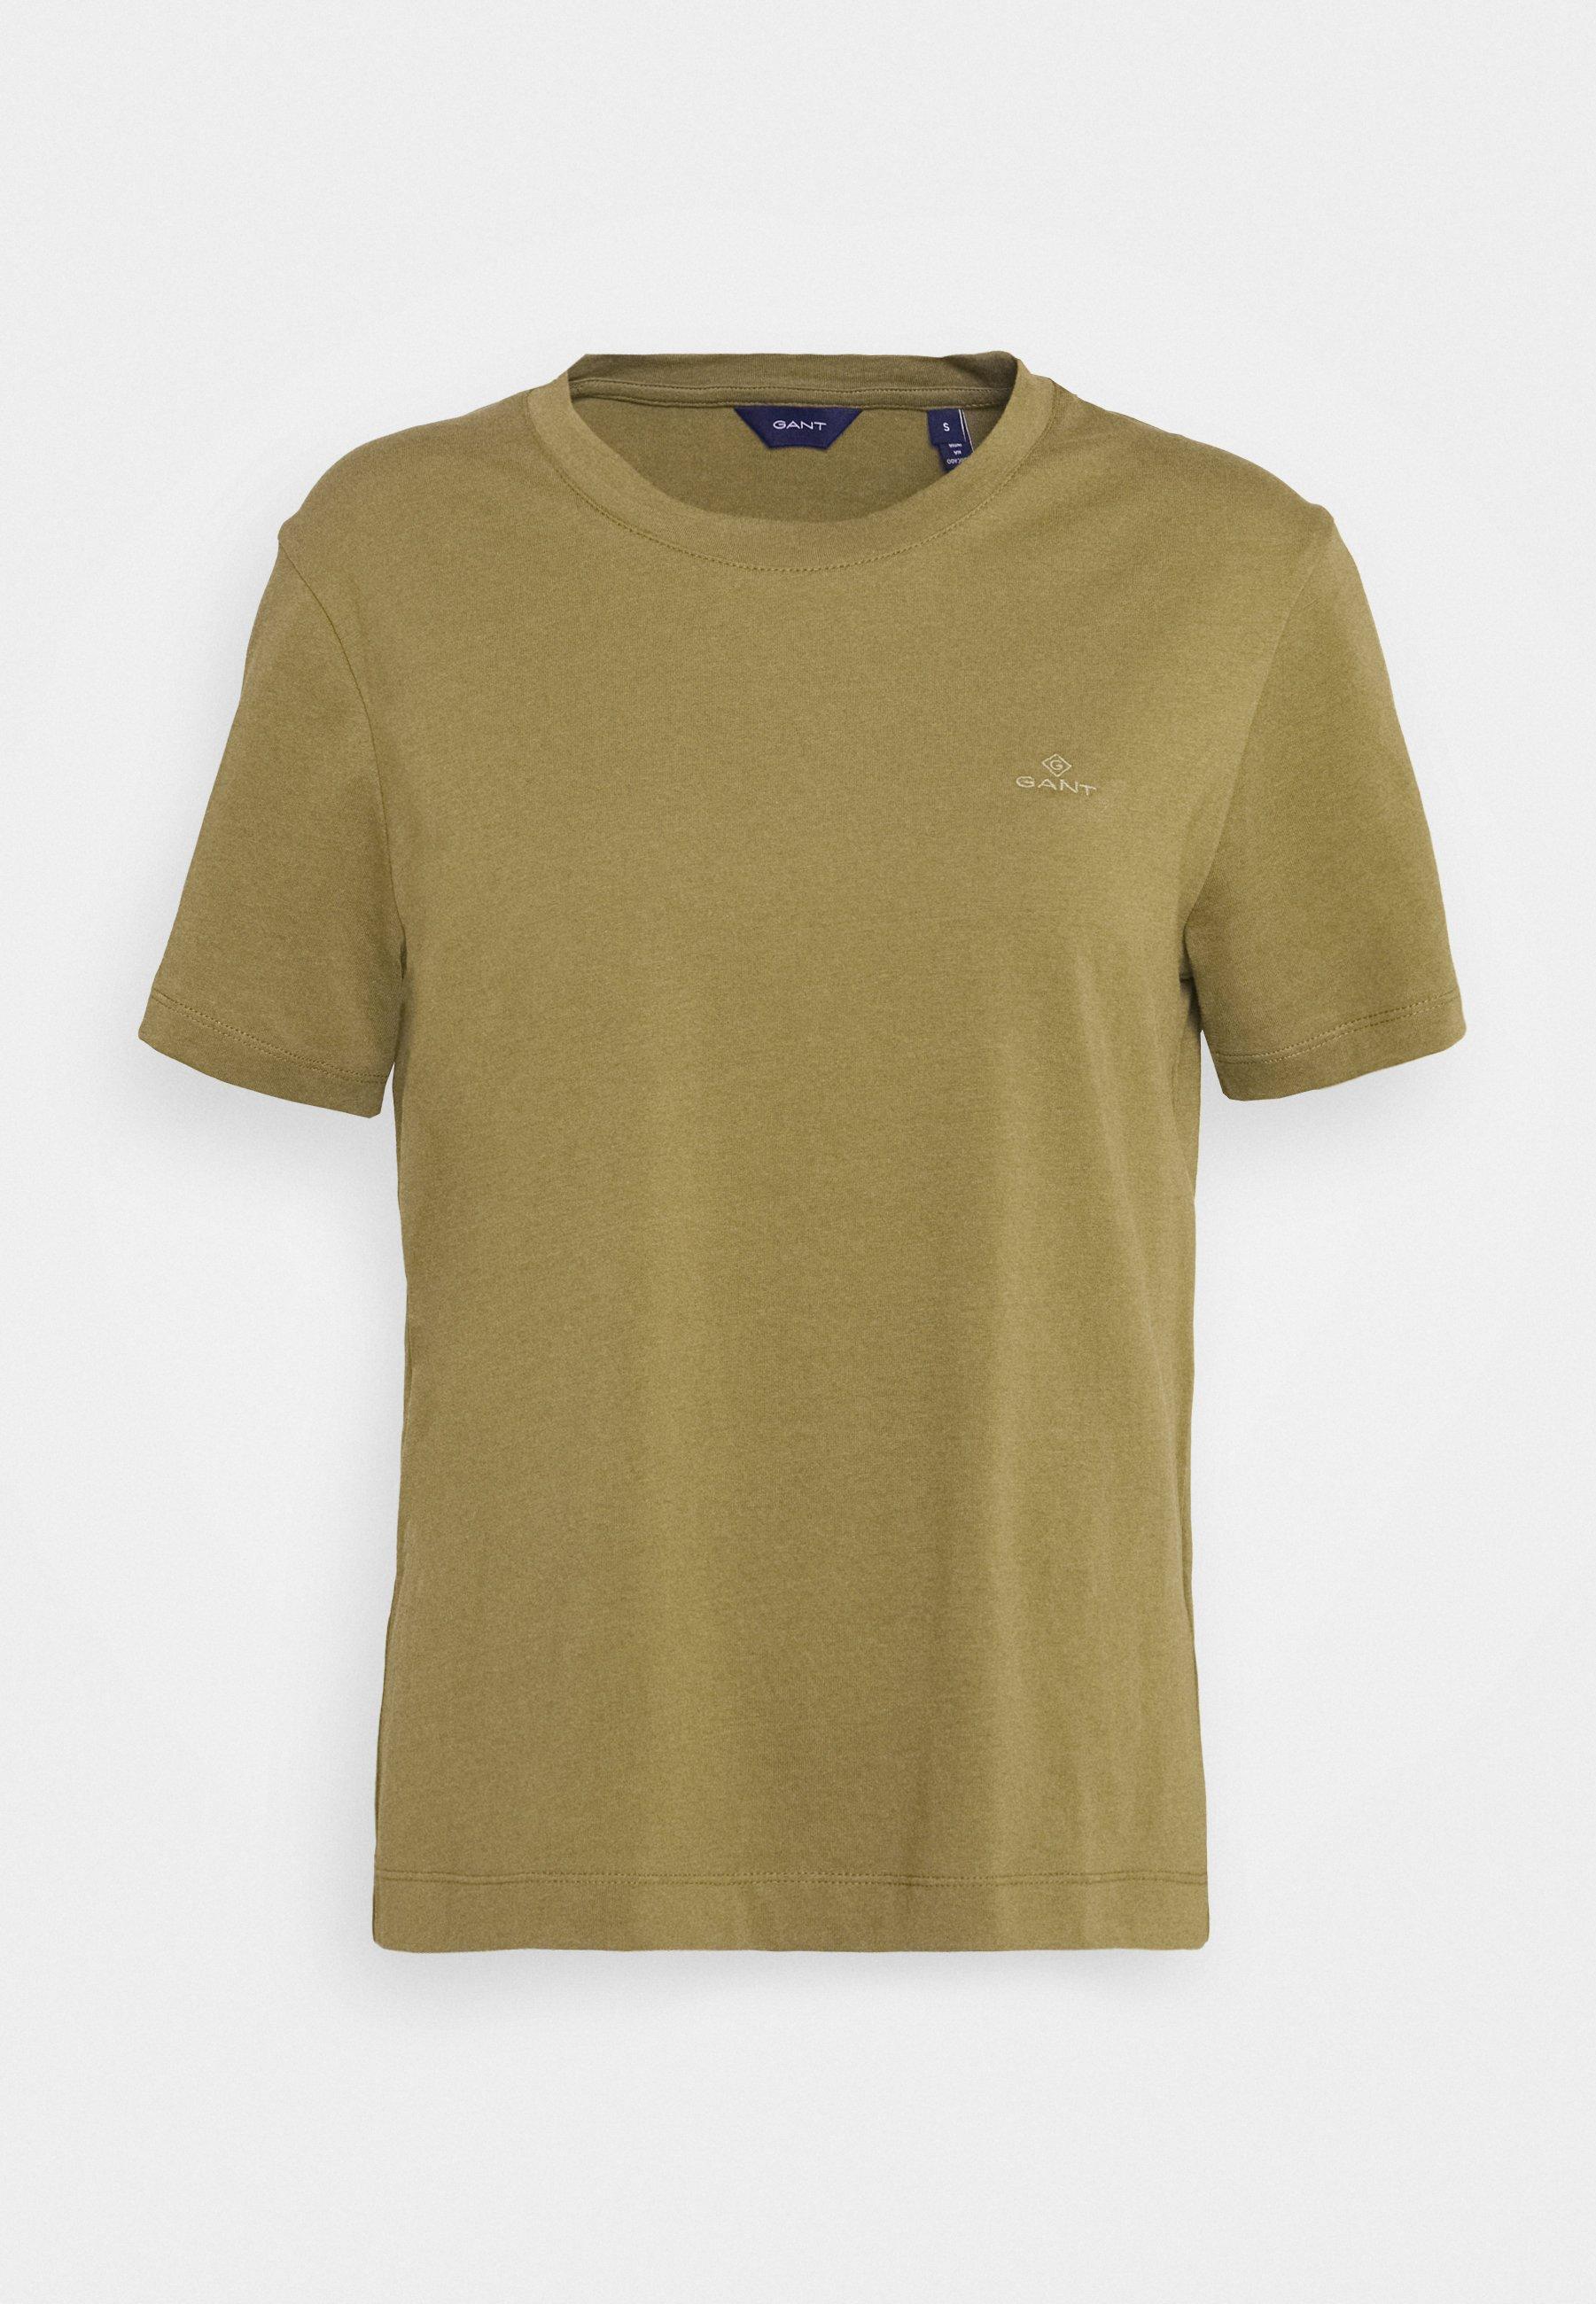 Gant The Original - T-shirts Olive Green/oliven